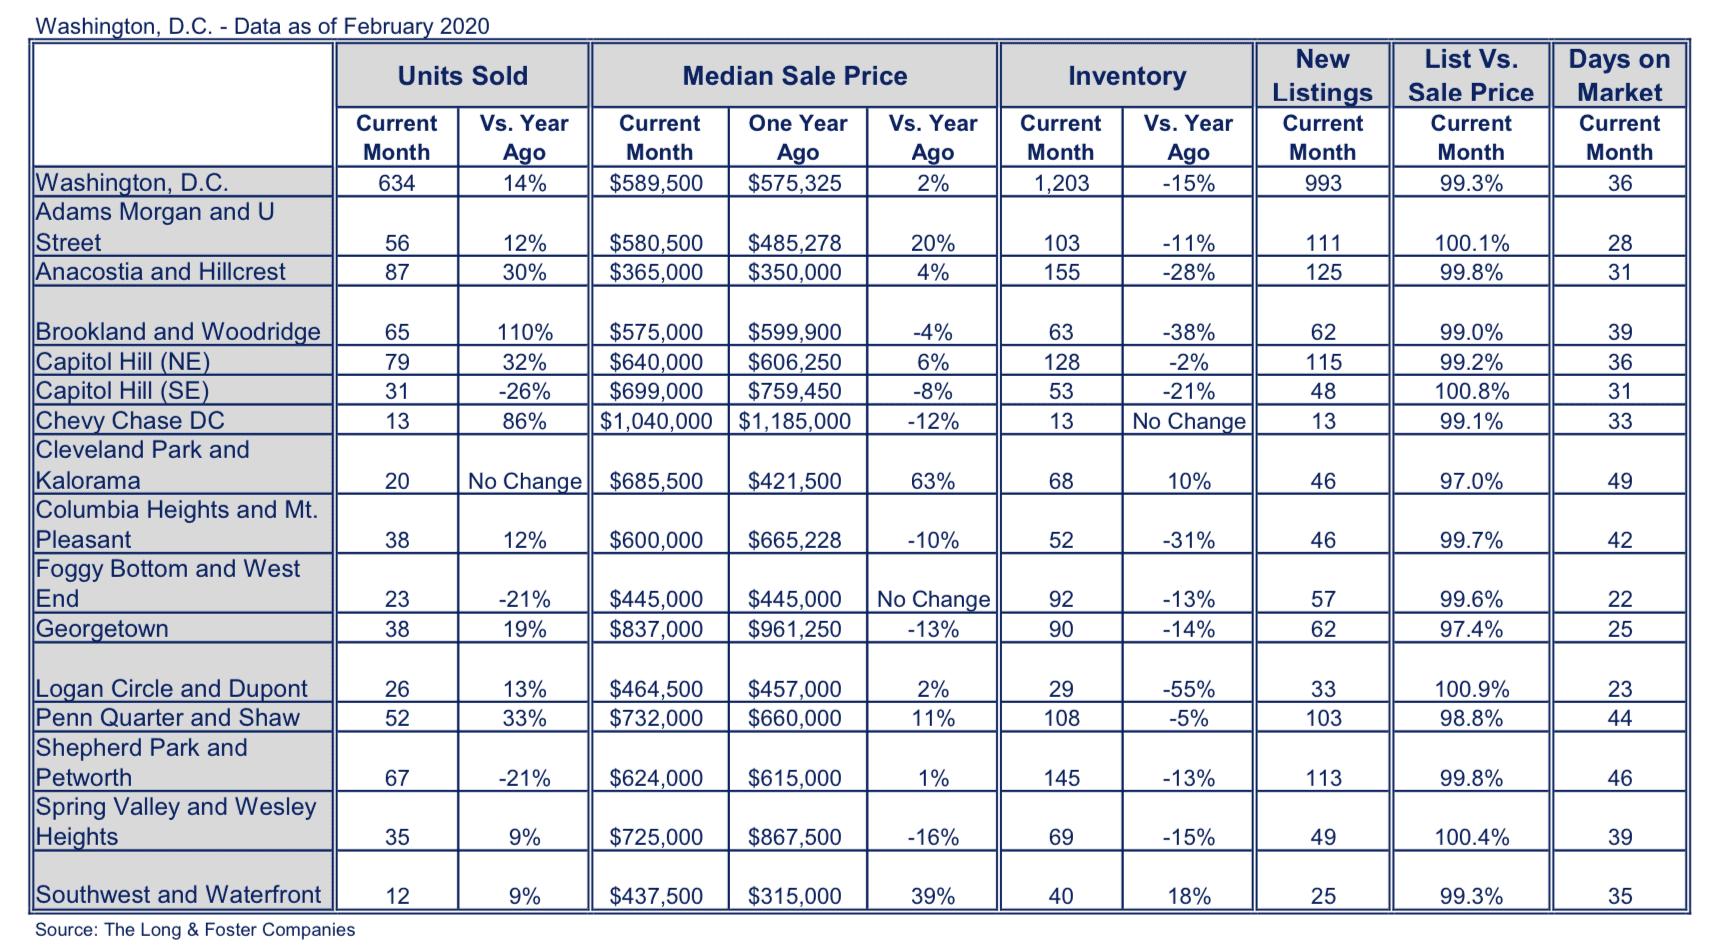 Washington, D.C. Market Minute Chart February 2020